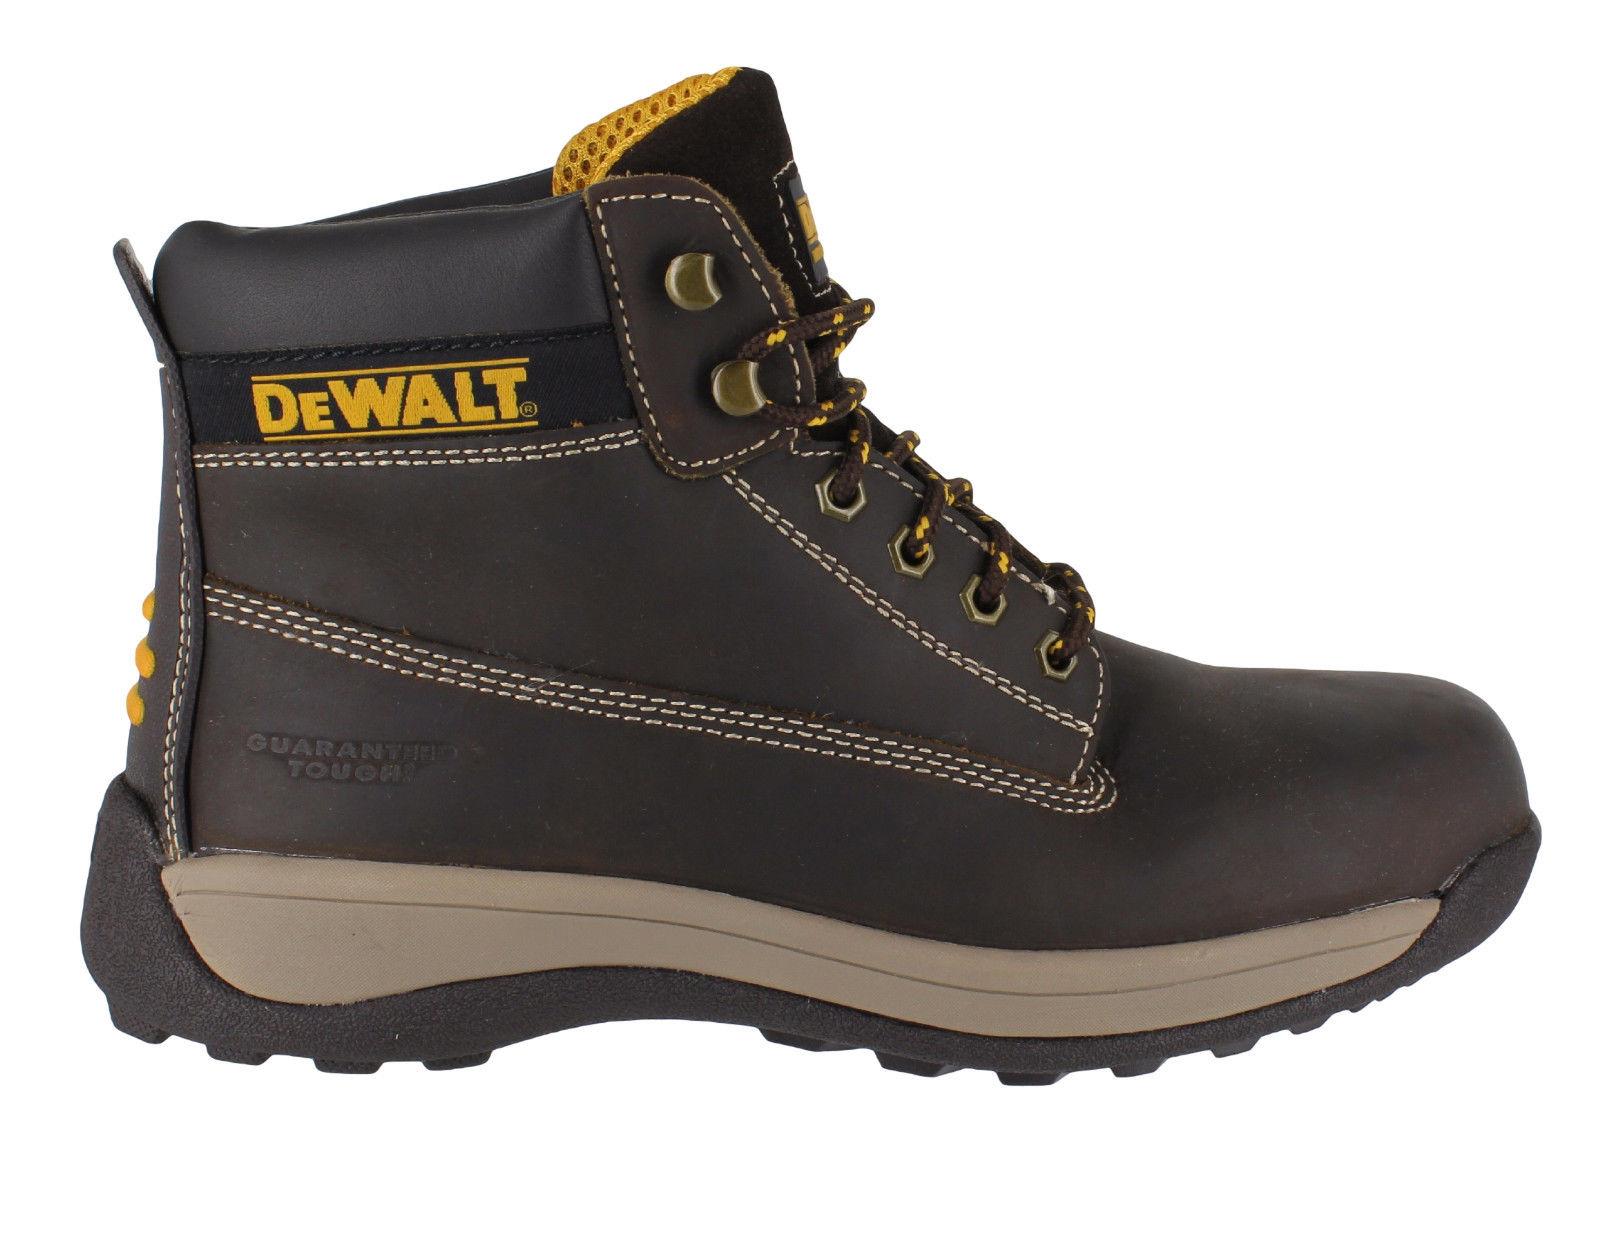 Dewalt Apprentice Mens Safety Boots Steel Toe Sb Ebay